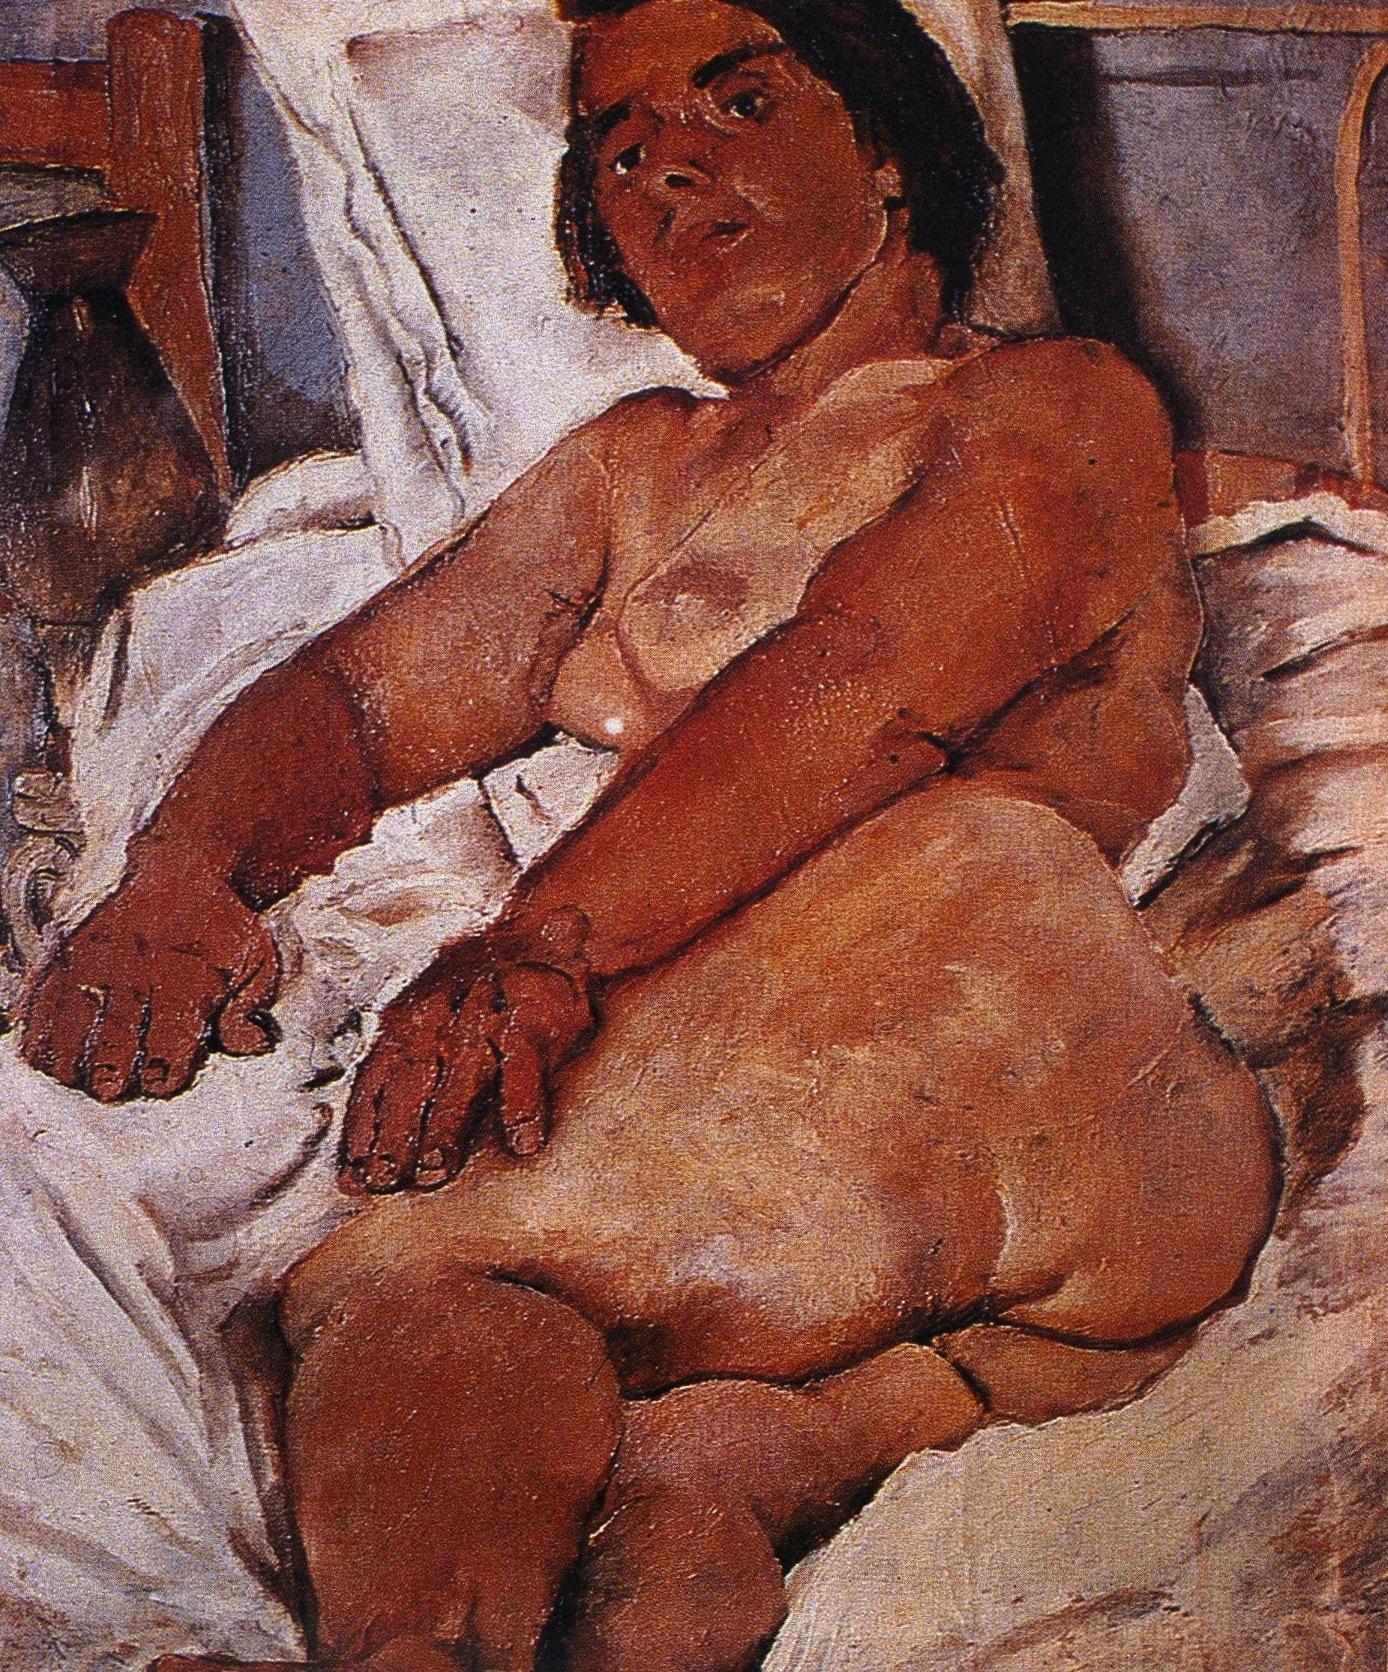 Fausto Pirandello - Nudo su sfondo bianco